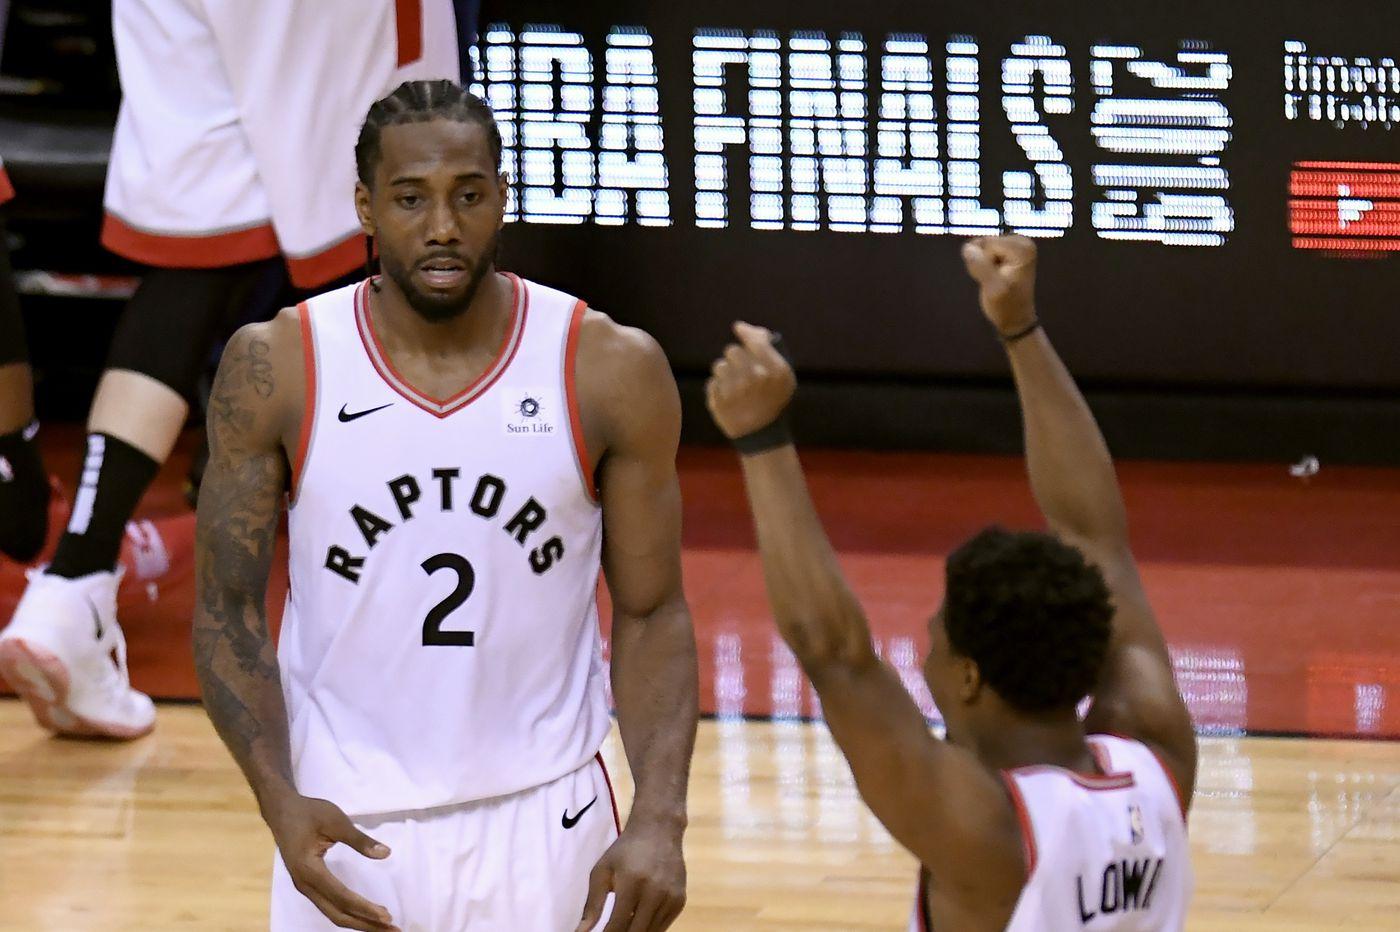 Raptors beat Bucks in NBA playoffs Game 6, advance to NBA Finals